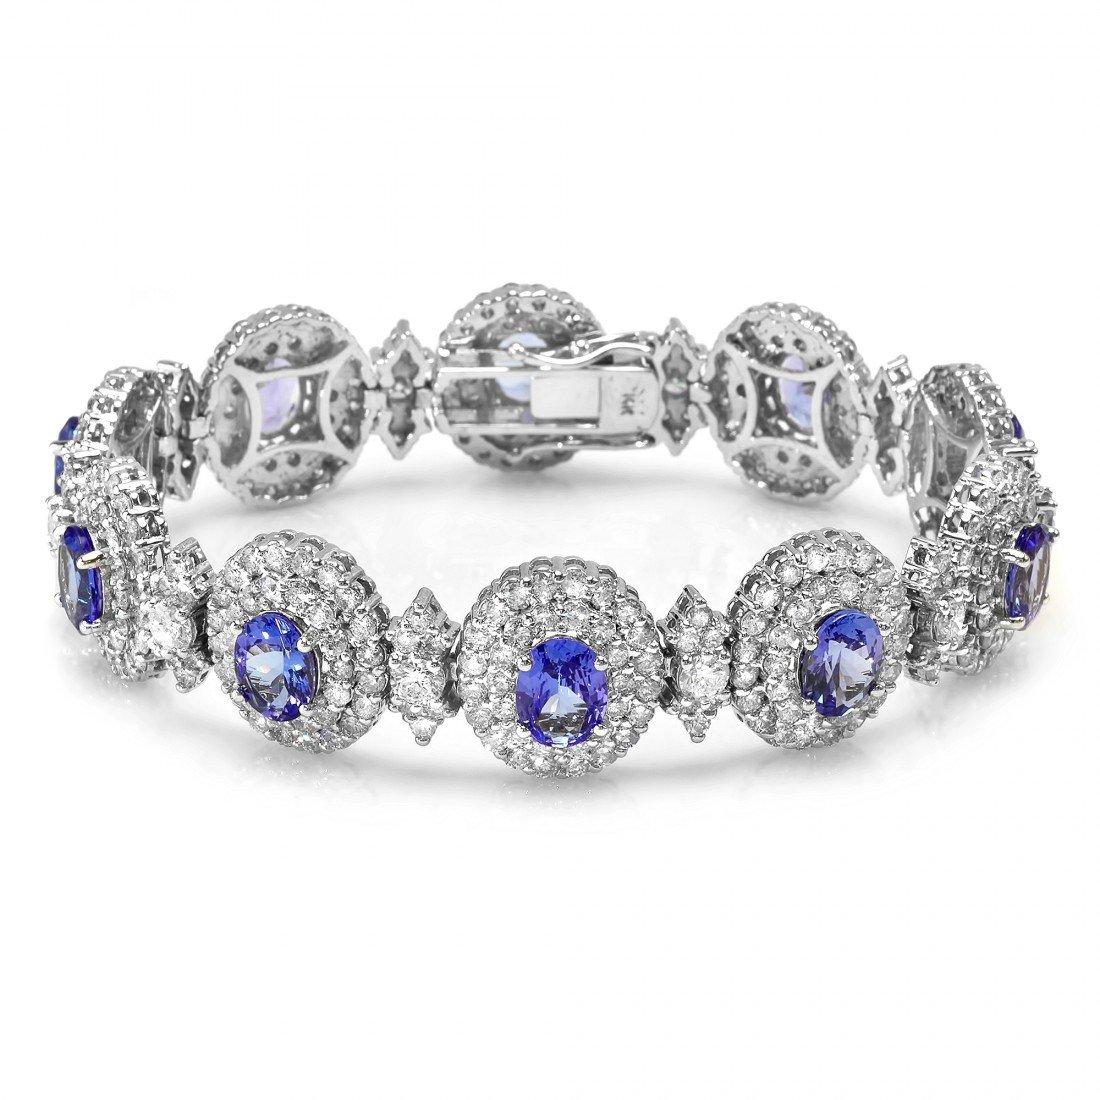 6: 14 kt bracelet with 13.76 carat in dia, 11.06 carat